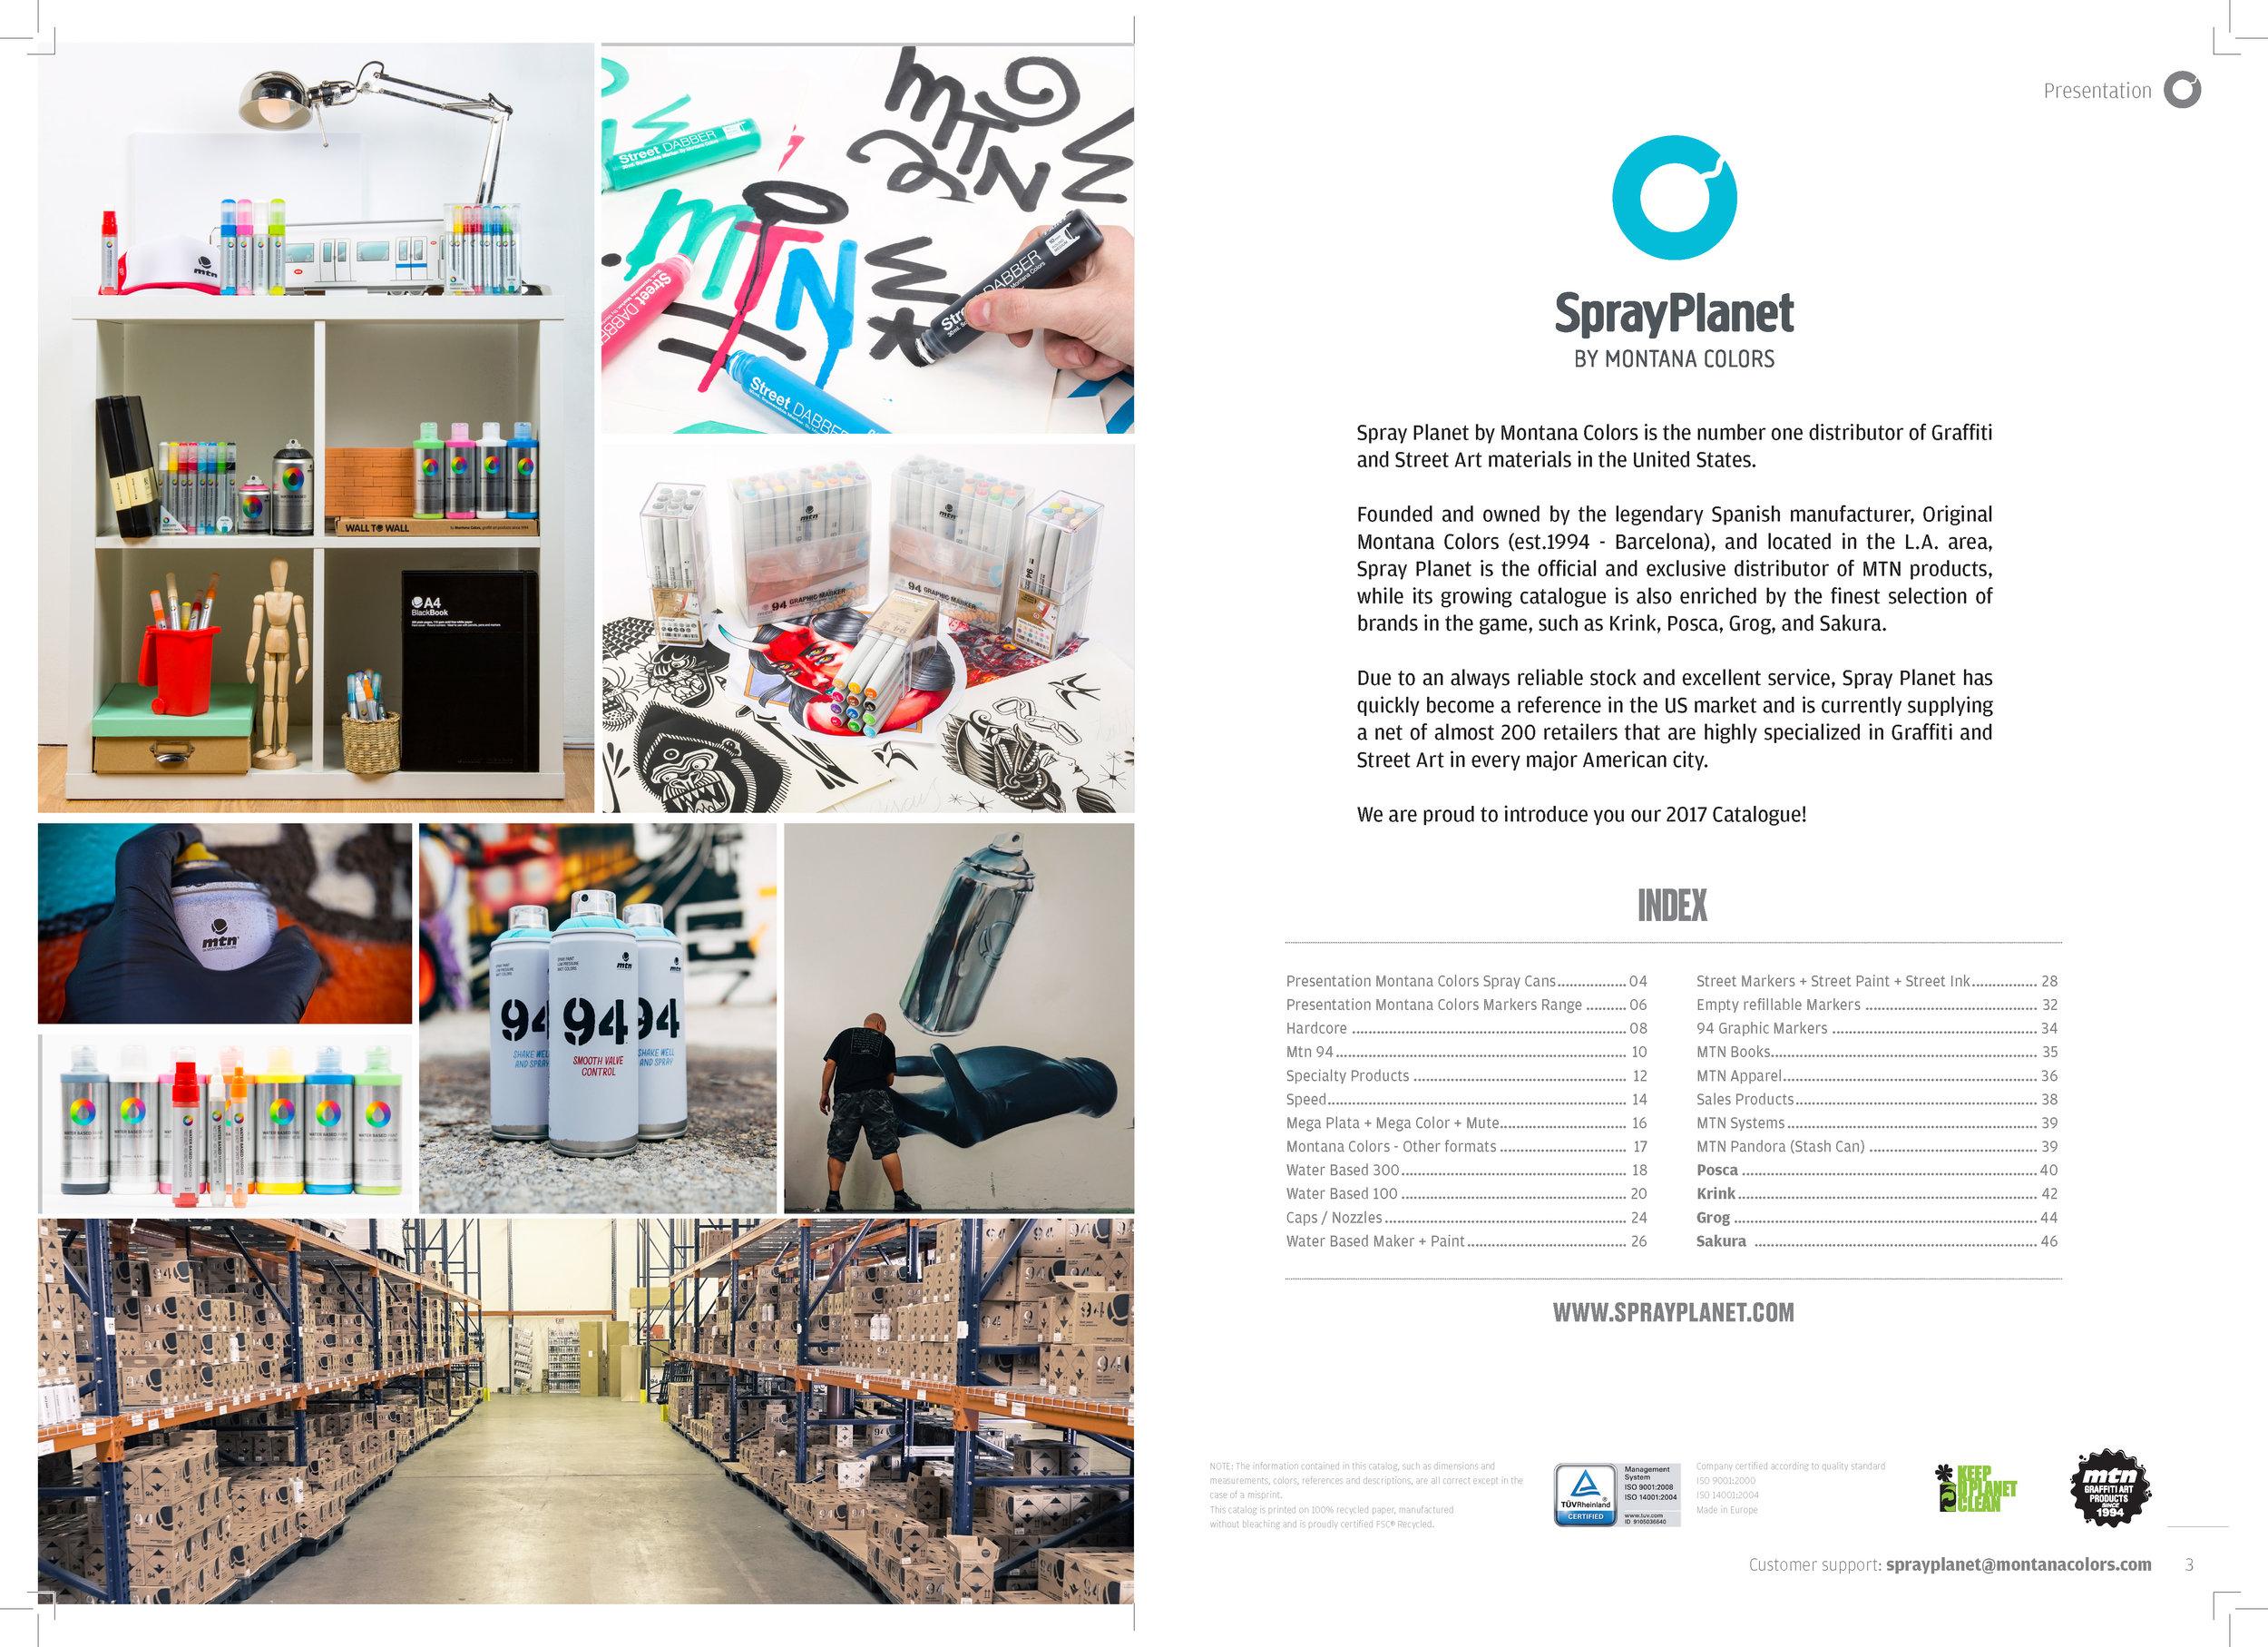 SprayPlanet-Catalog-2017_Page_02.jpg